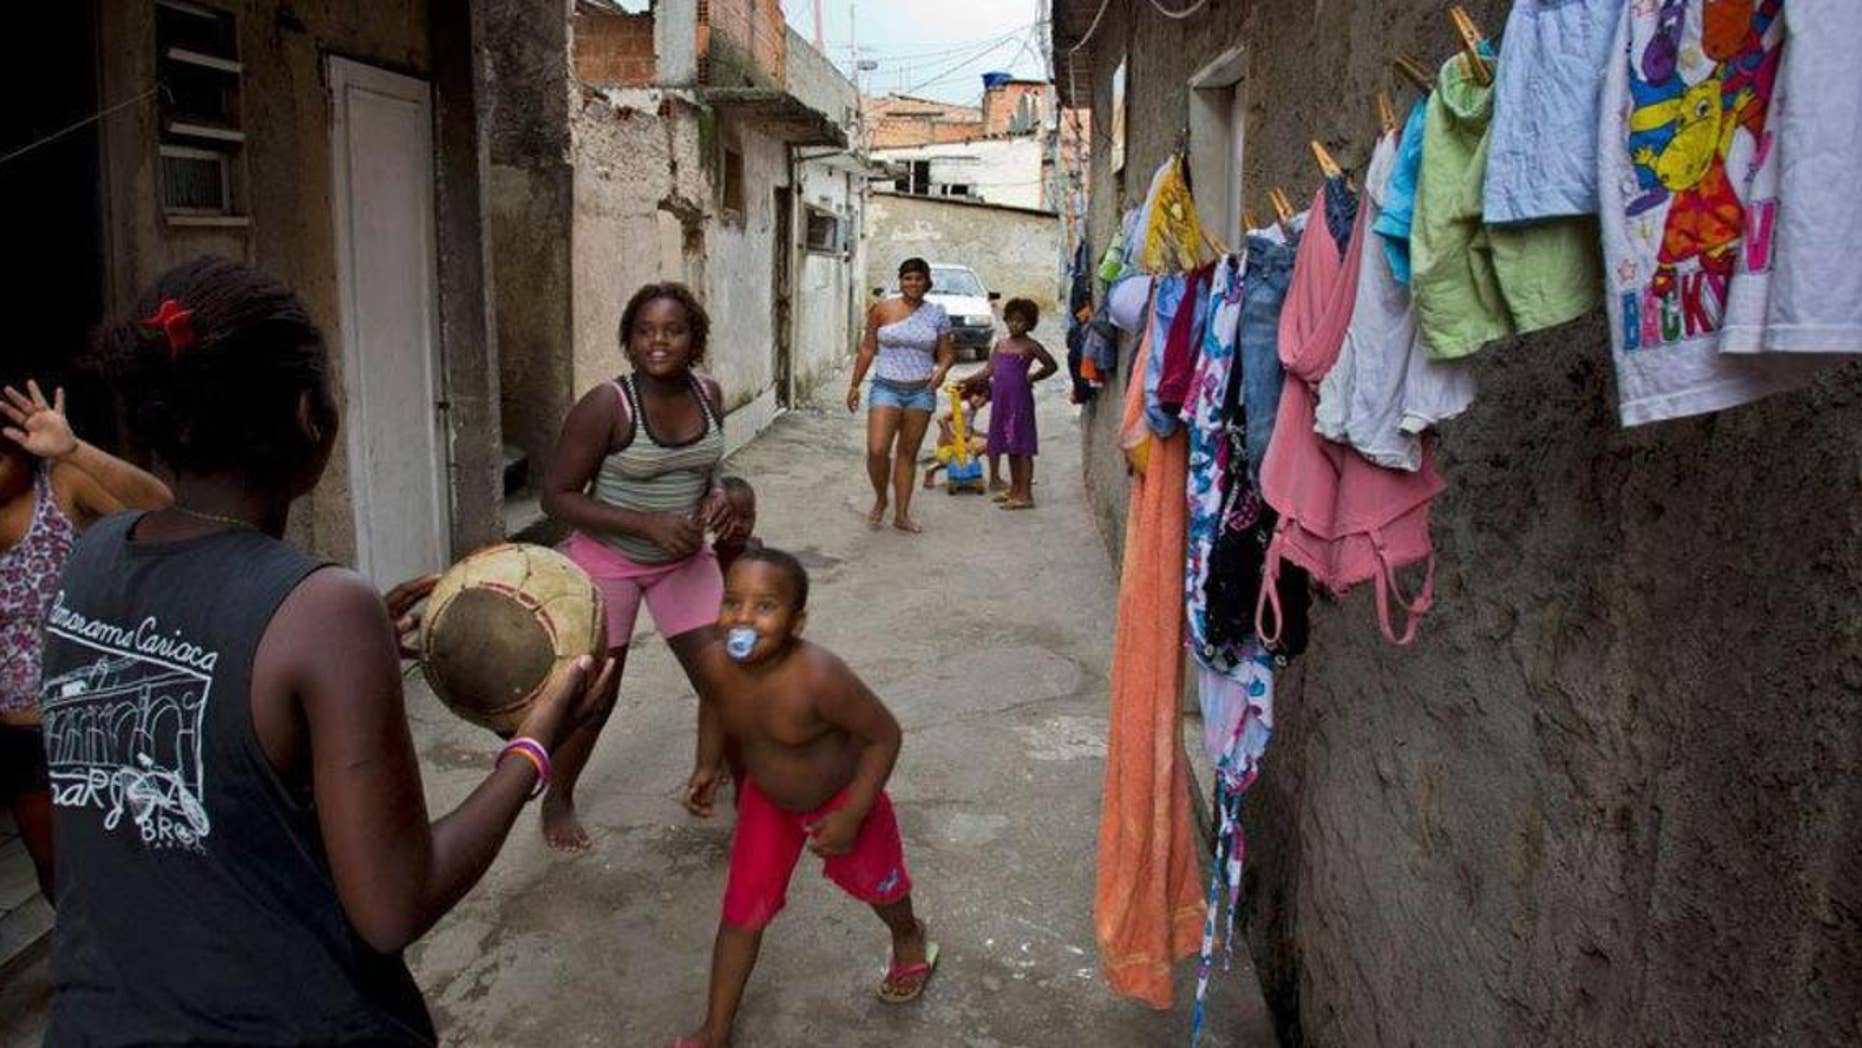 Children play in Favela do Metro shantytown in Rio de Janeiro, Brazil.